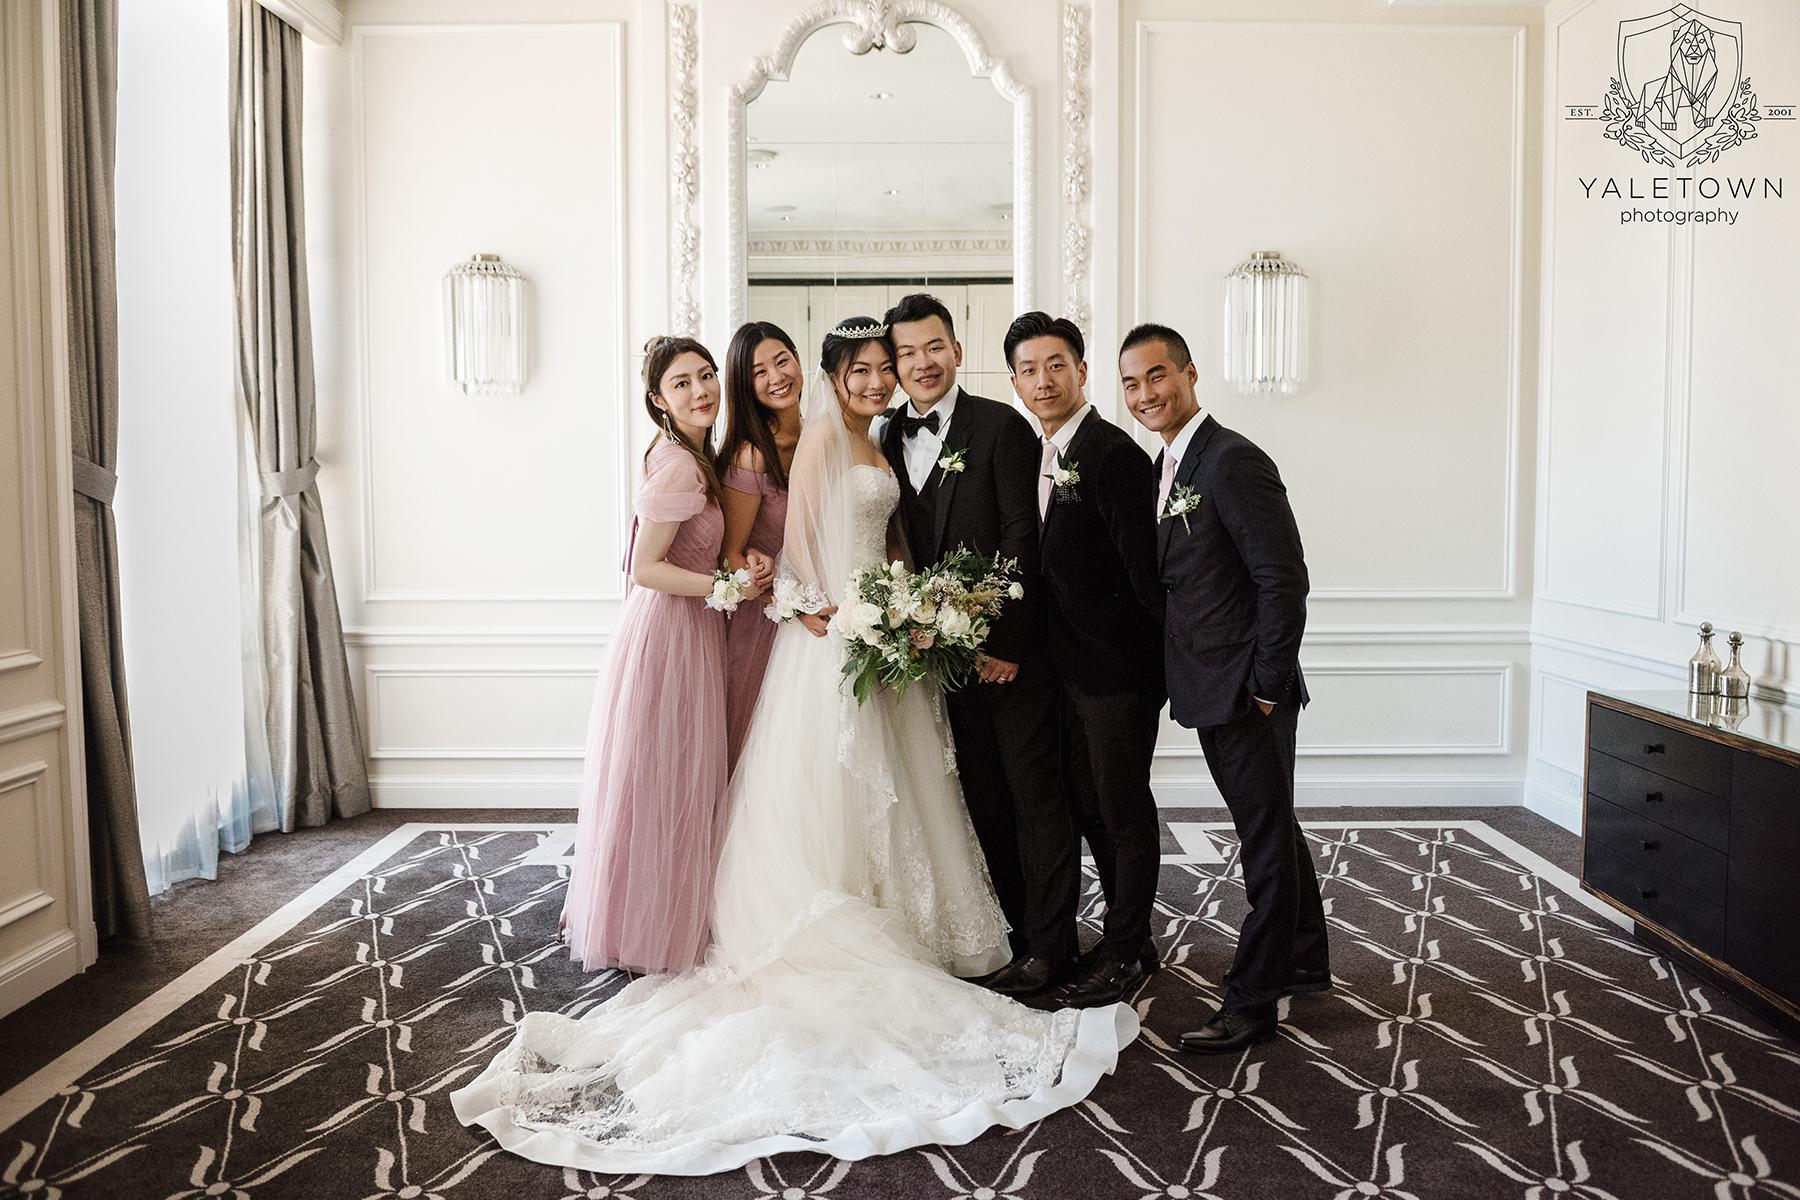 Bride-Groom-Bridesmaids-Groomsmen-PortraitsRosewood-Hotel-Georgia-Vancouver-Wedding-Yaletown-Photography-photo